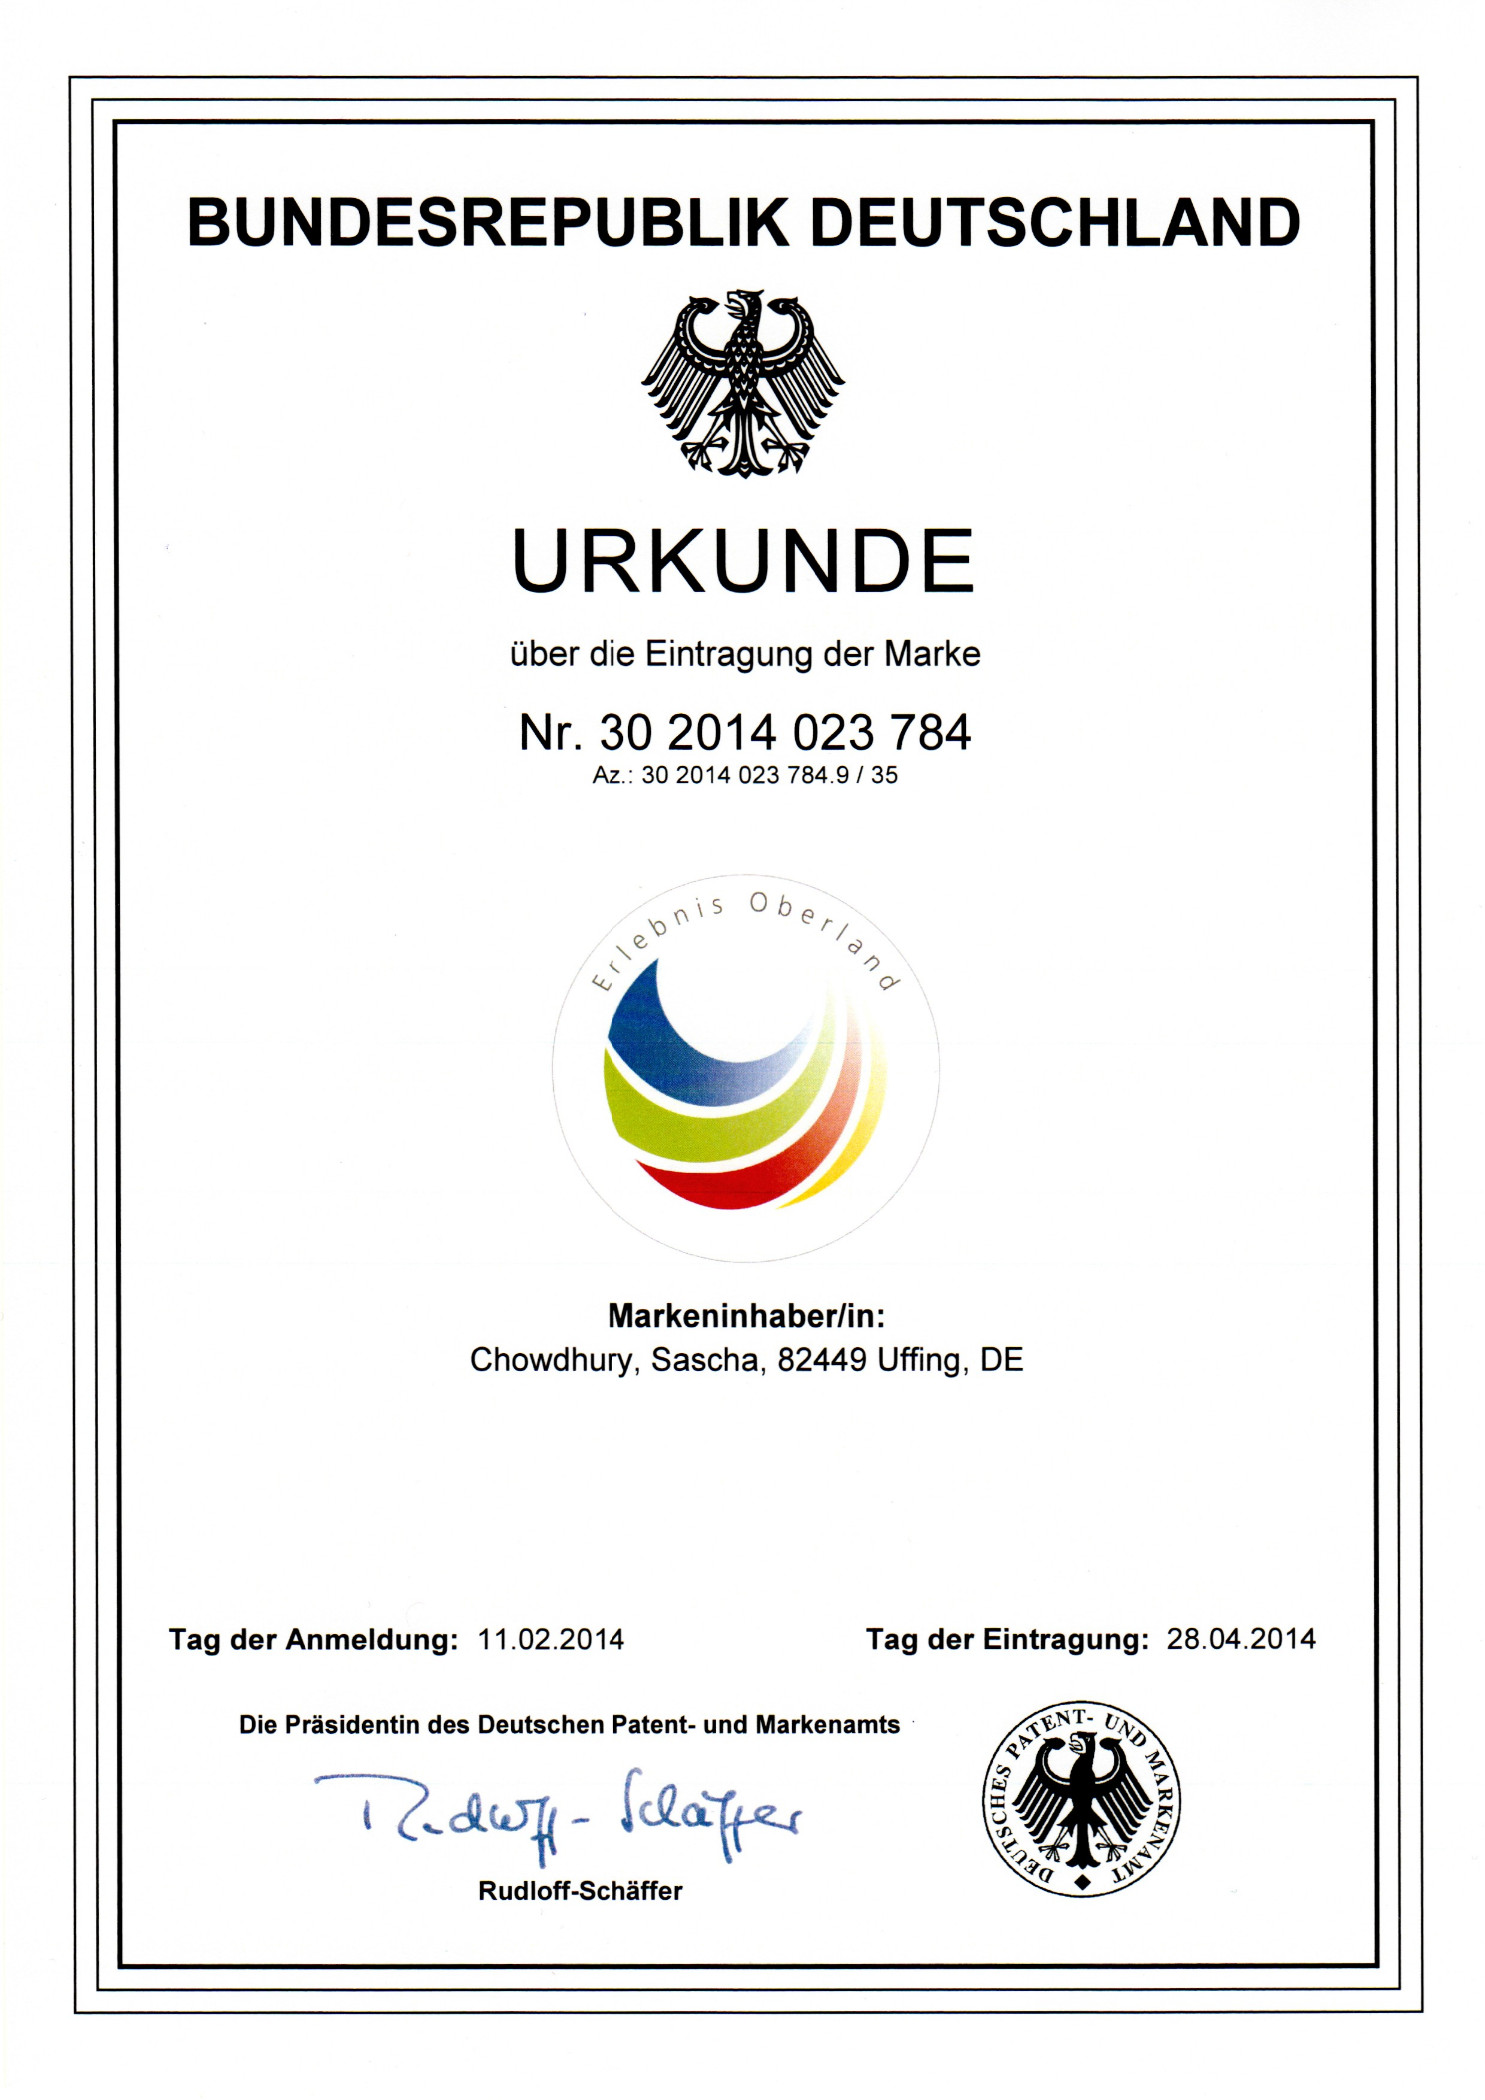 Contemporary Wort Diplom Vorlage Mold - FORTSETZUNG ARBEITSBLATT ...